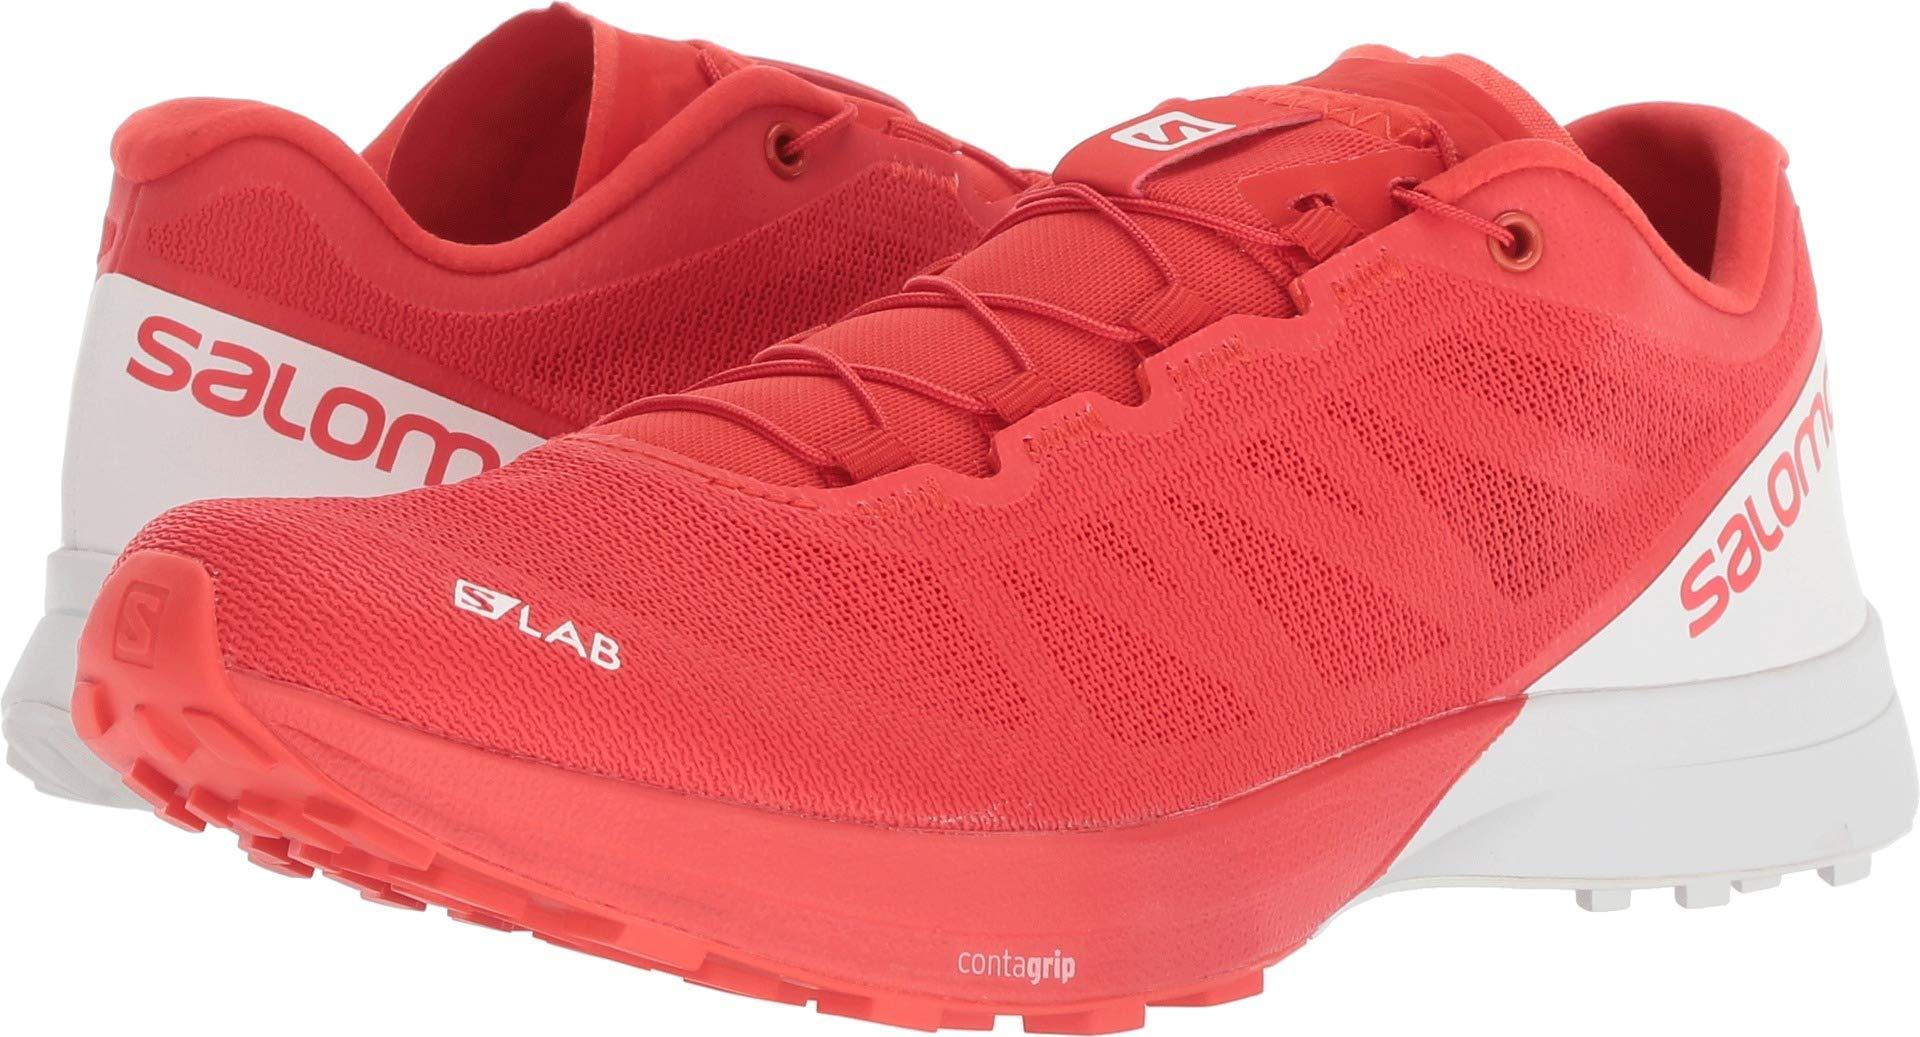 quality design 81752 6f2ca Salomon S-Lab Sense 7 Trail Running Shoes - Racing Red/White/White 6